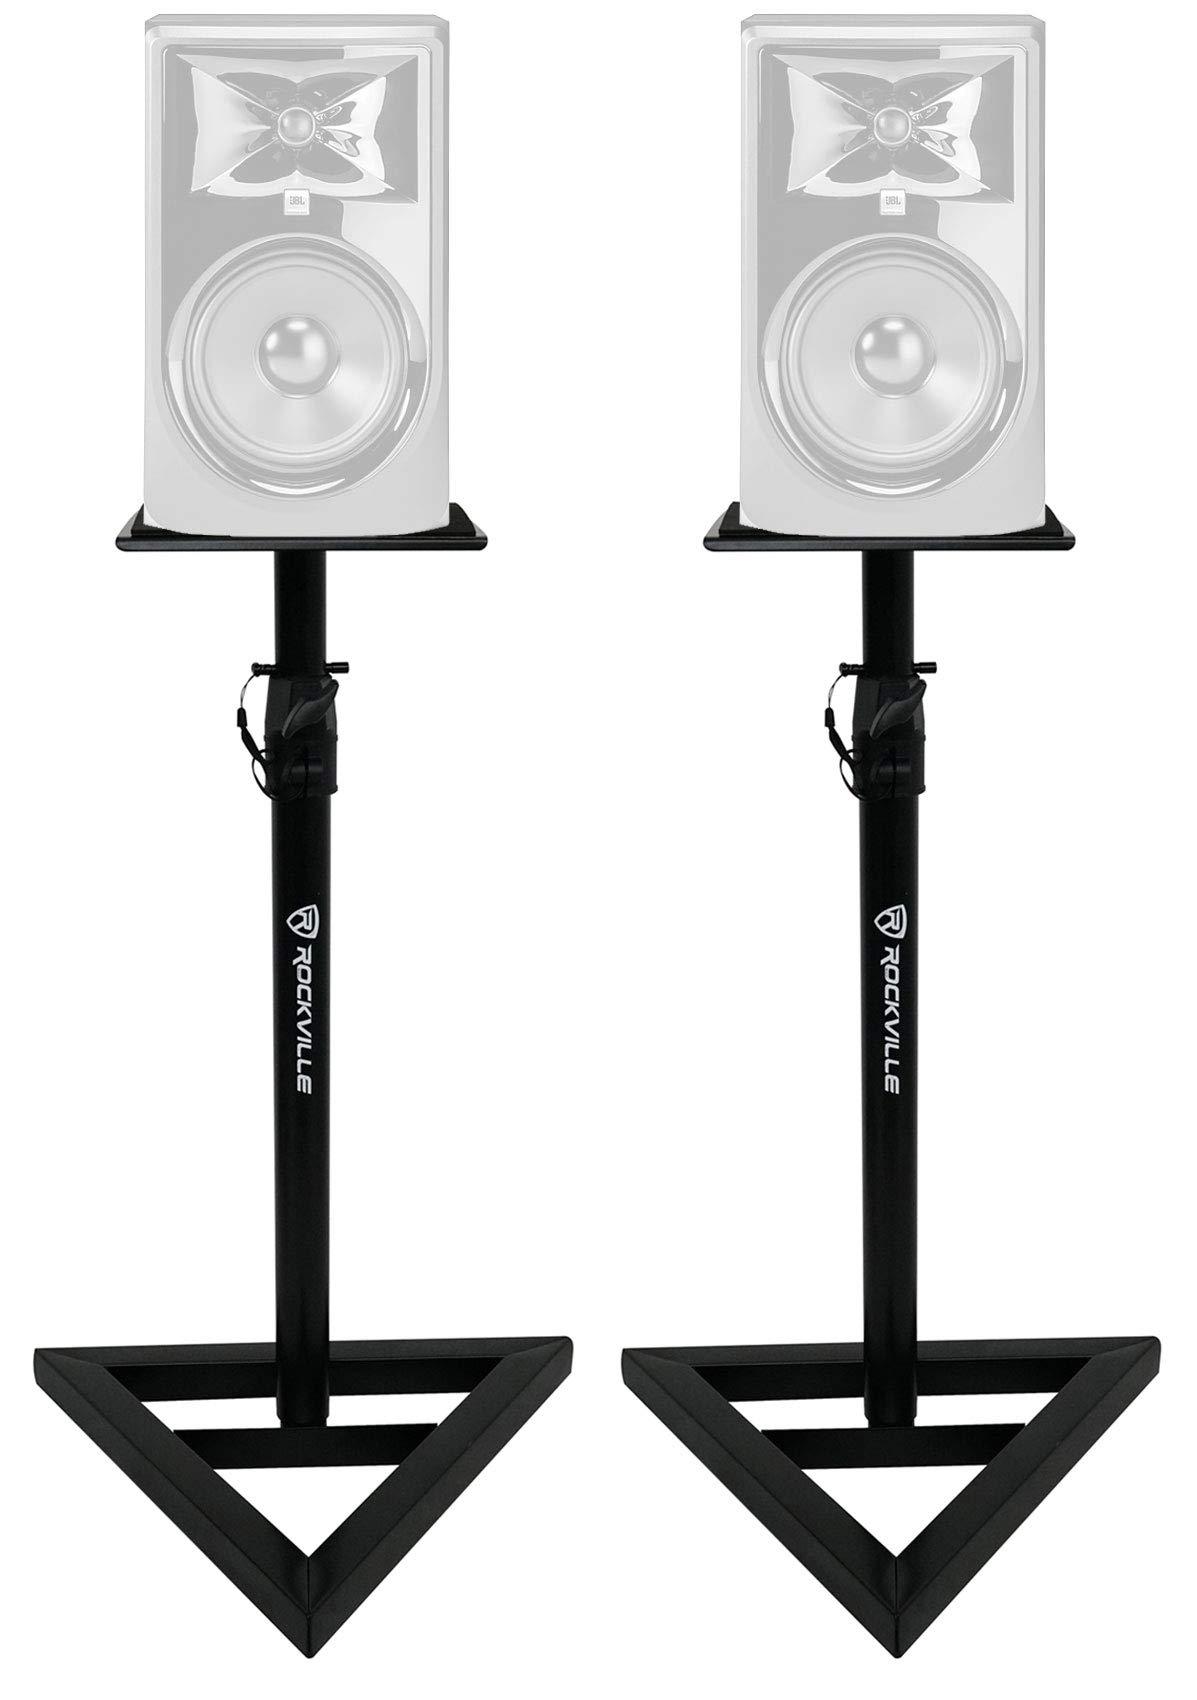 2) Rockville Adjustable Studio Monitor Speaker Stands For JBL 308P MKII Monitors